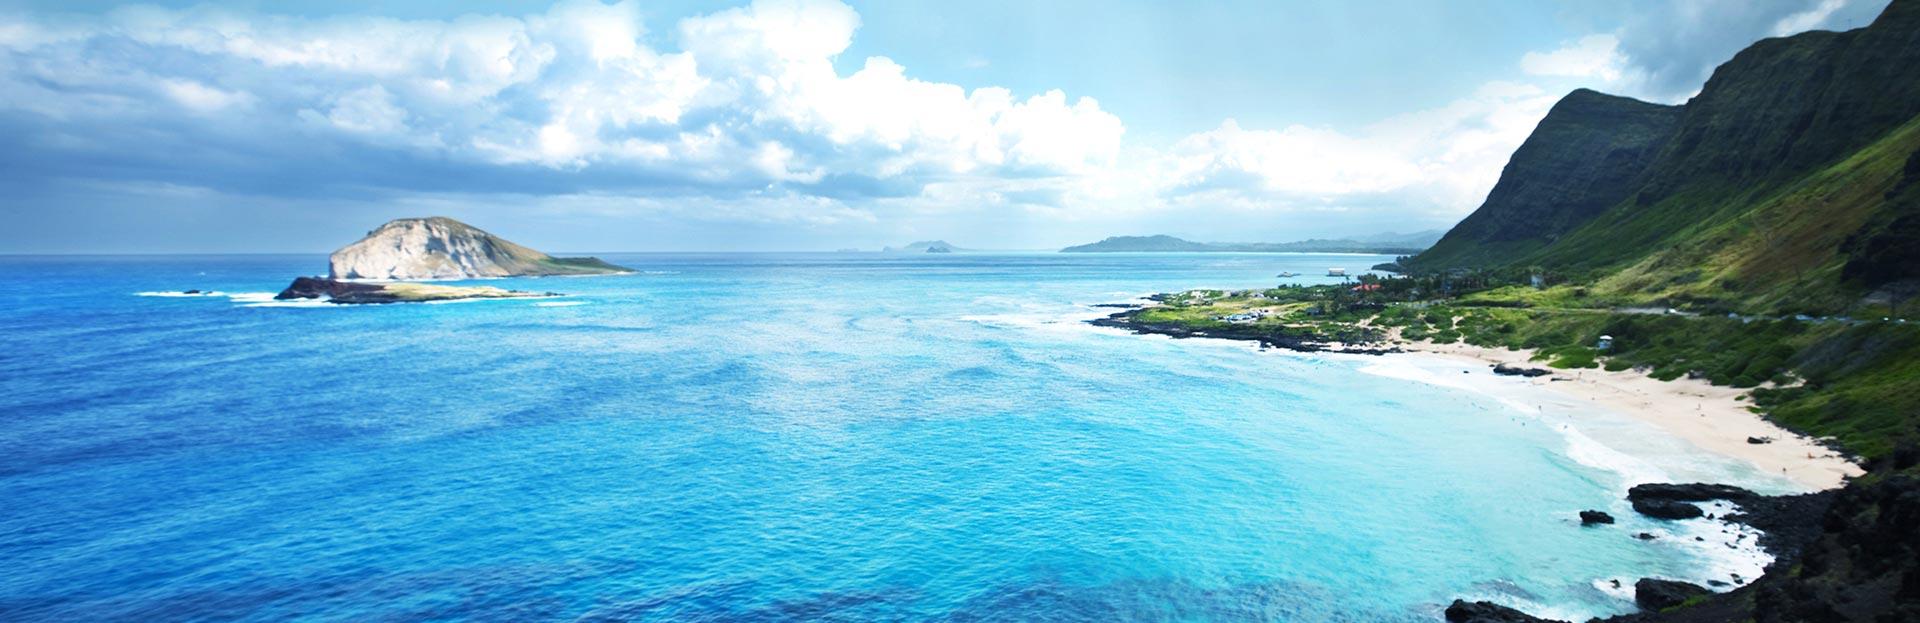 Cheap ass airline tickets to hawaii